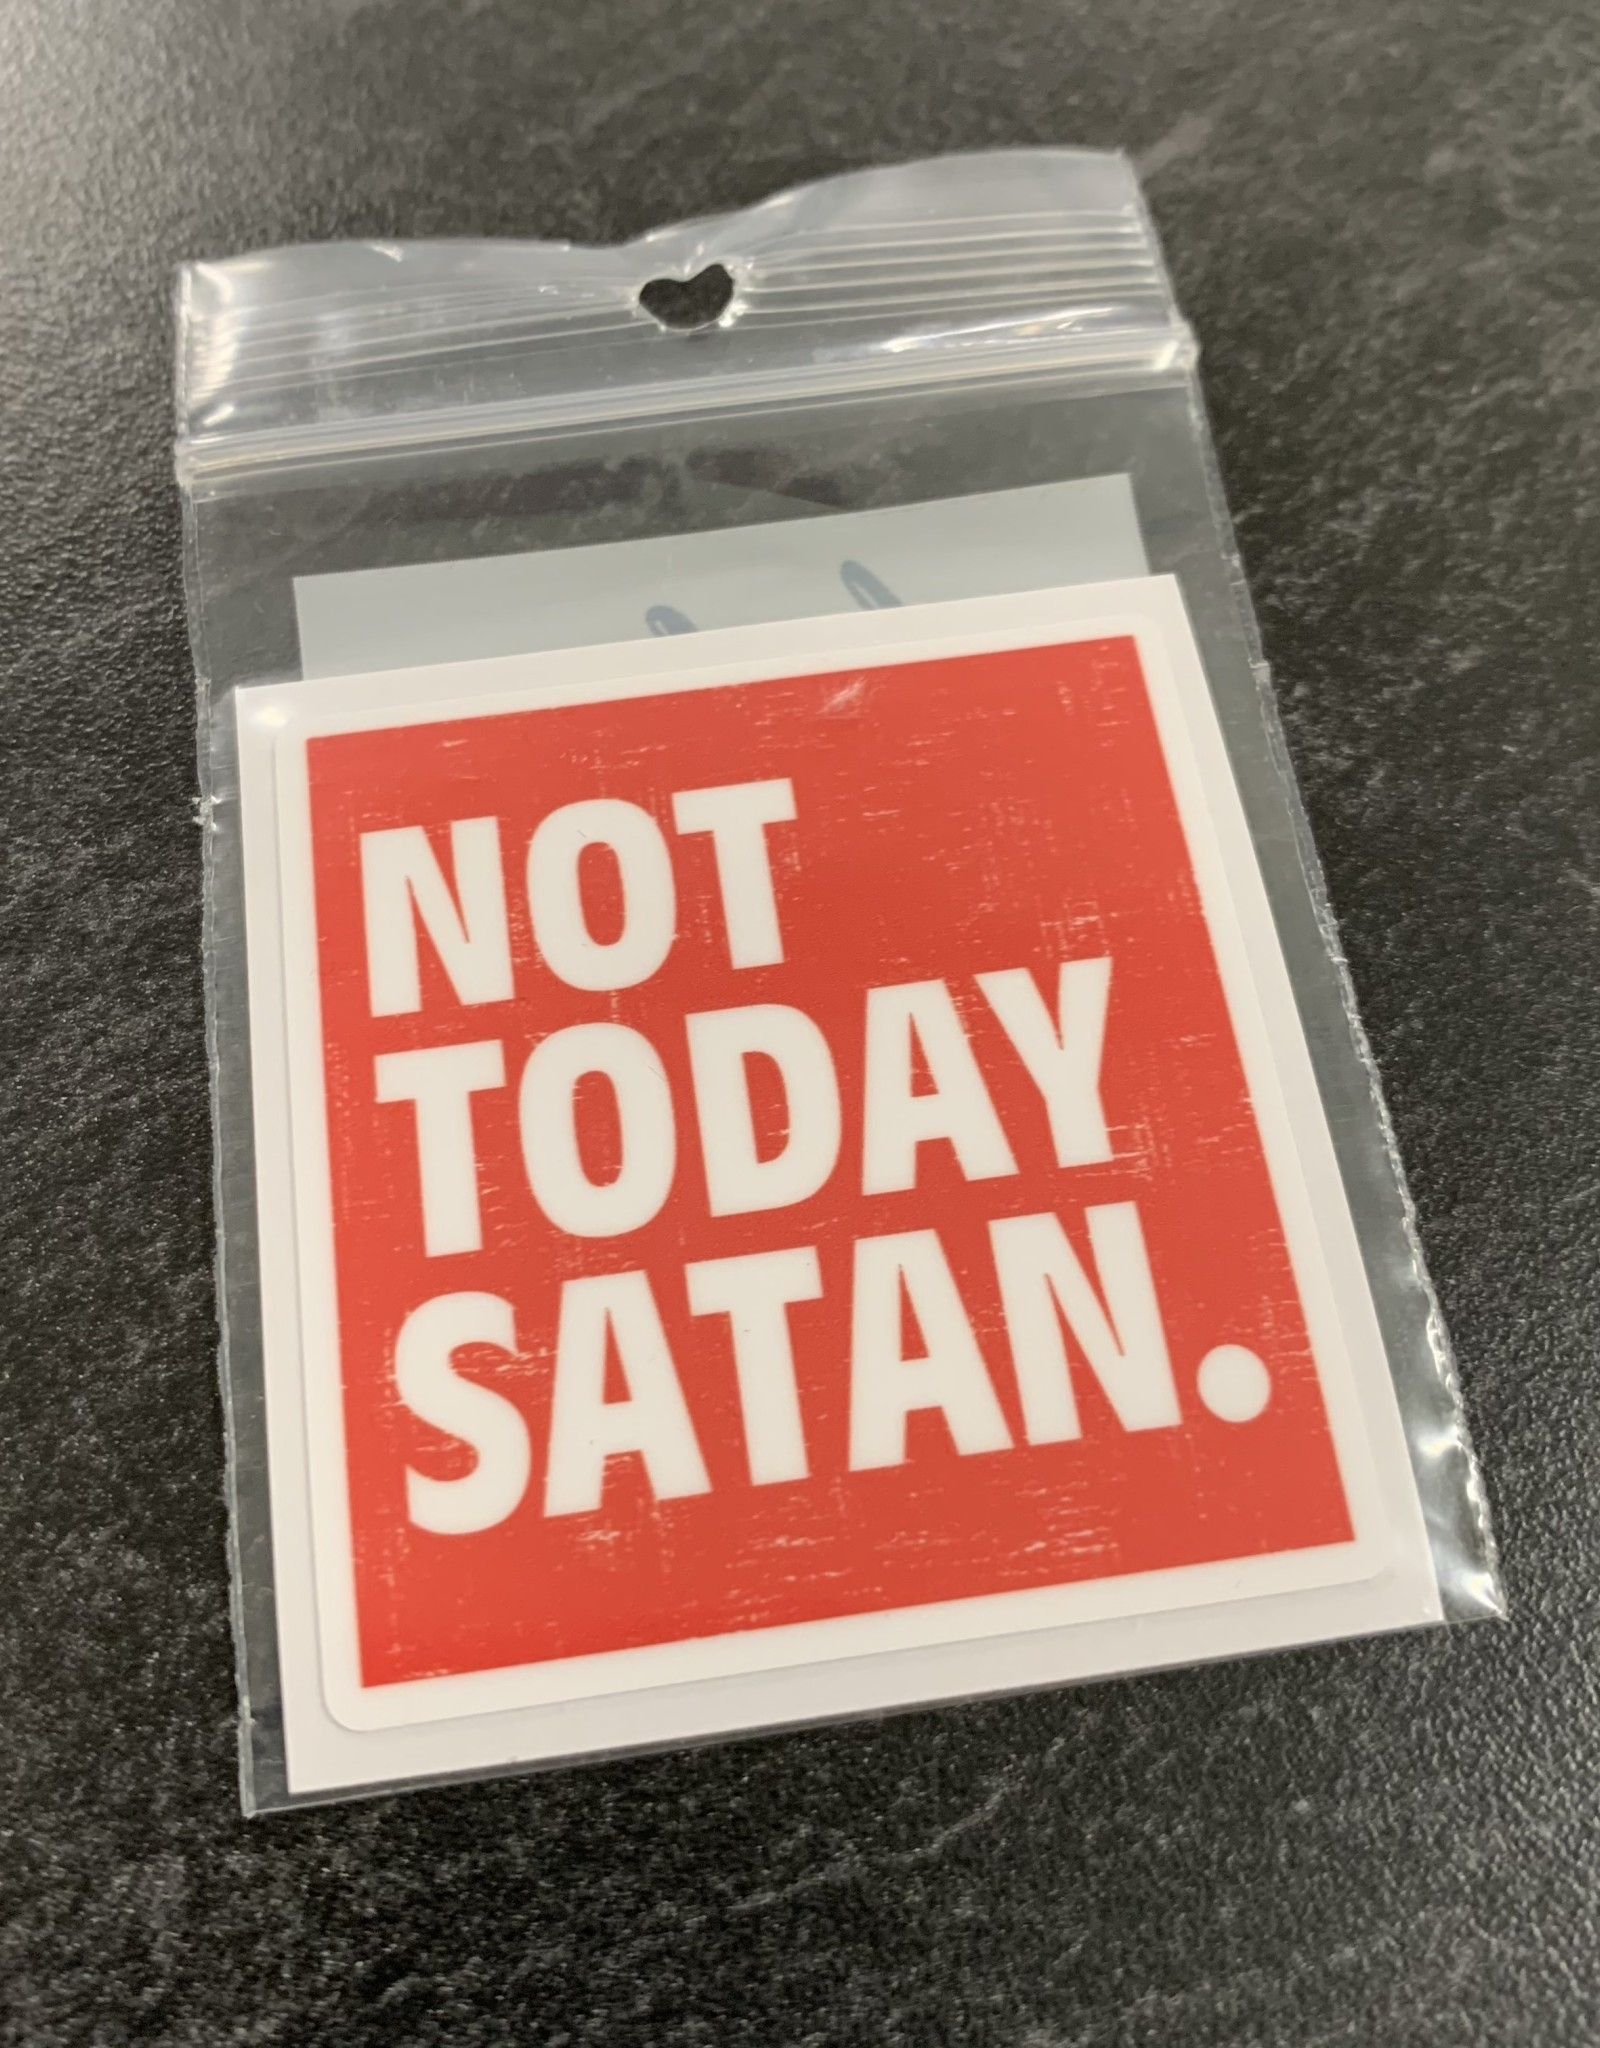 NOT TODAY SATAN STICKER (CELL)